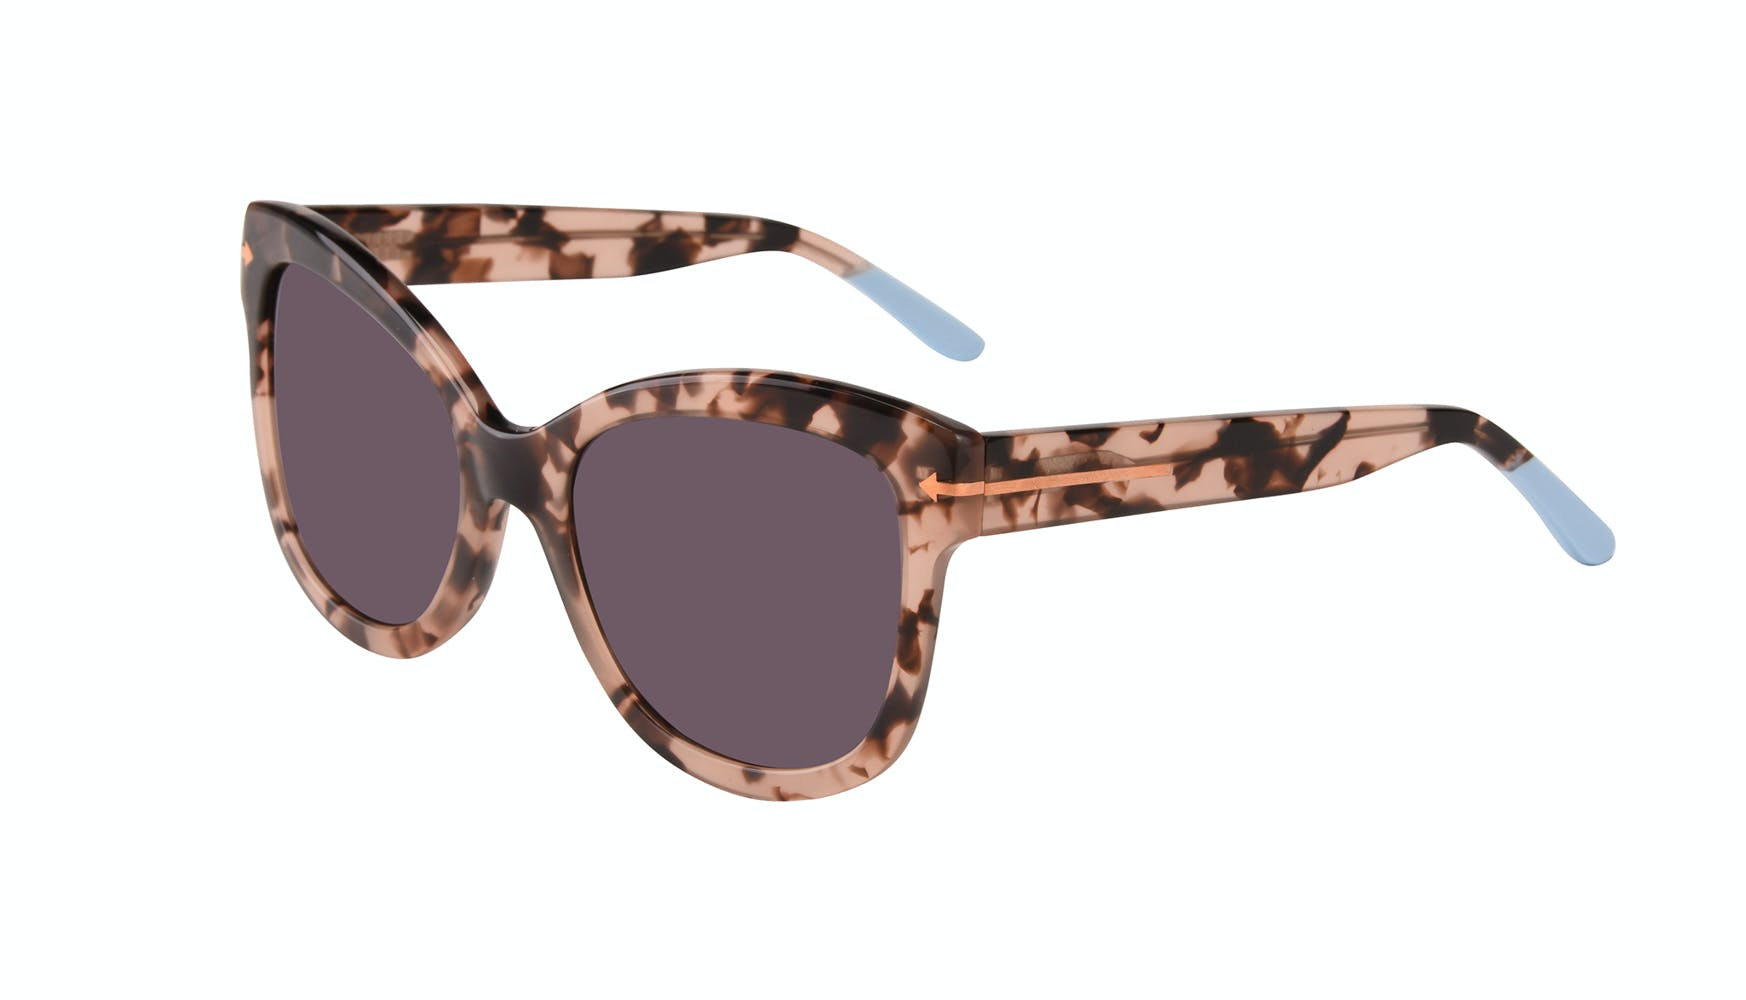 Affordable Fashion Glasses Cat Eye Square Sunglasses Women Marlo Coastal Tilt